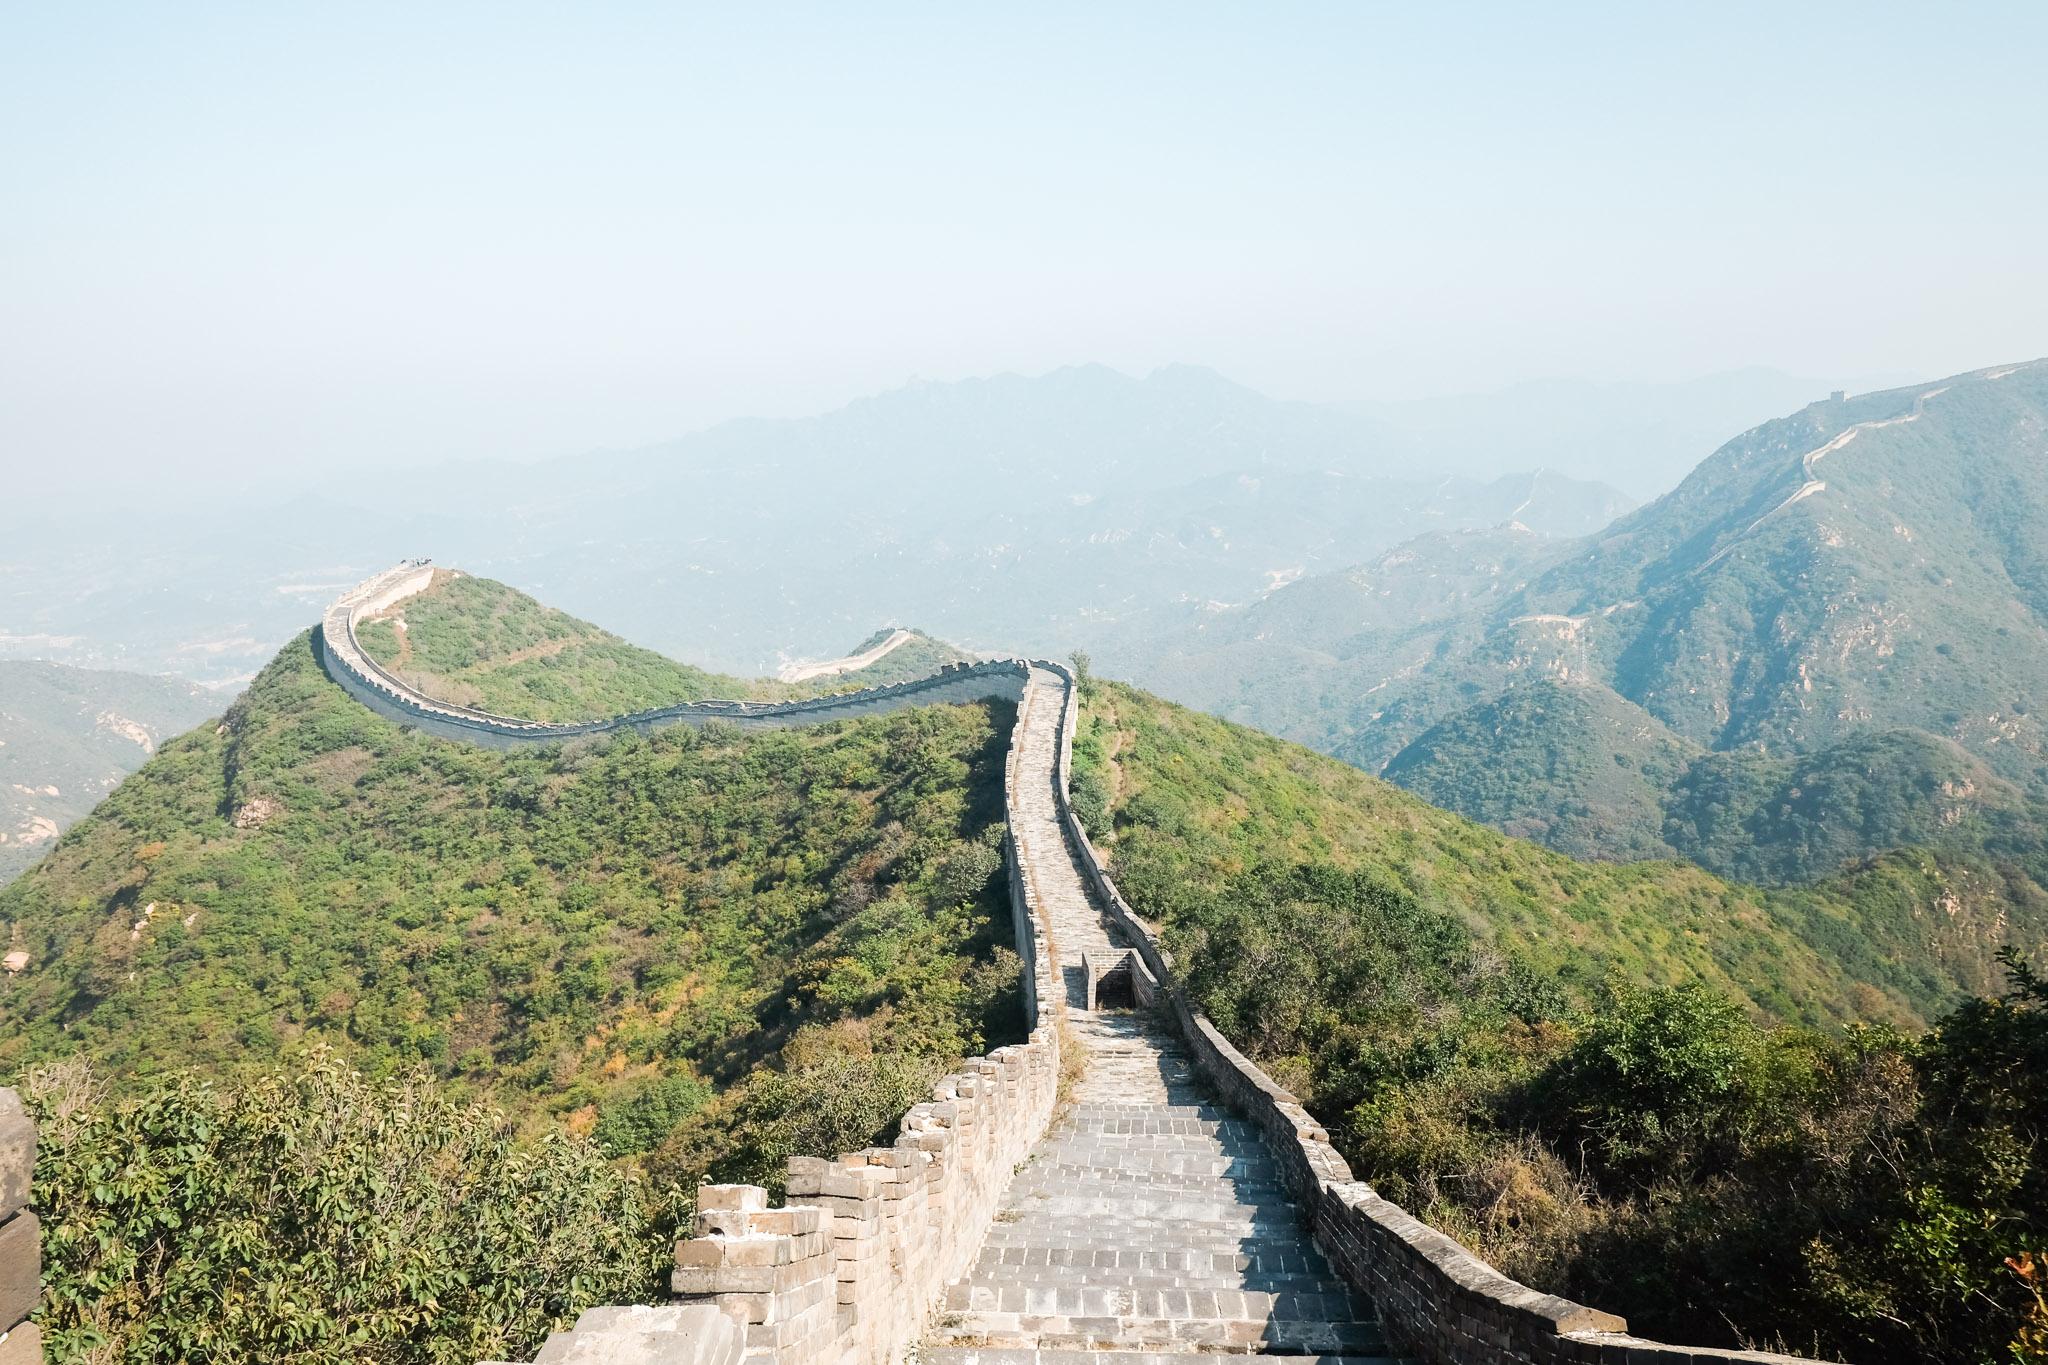 china-beijing-mutianwu-great-wall-of-china-2.jpg